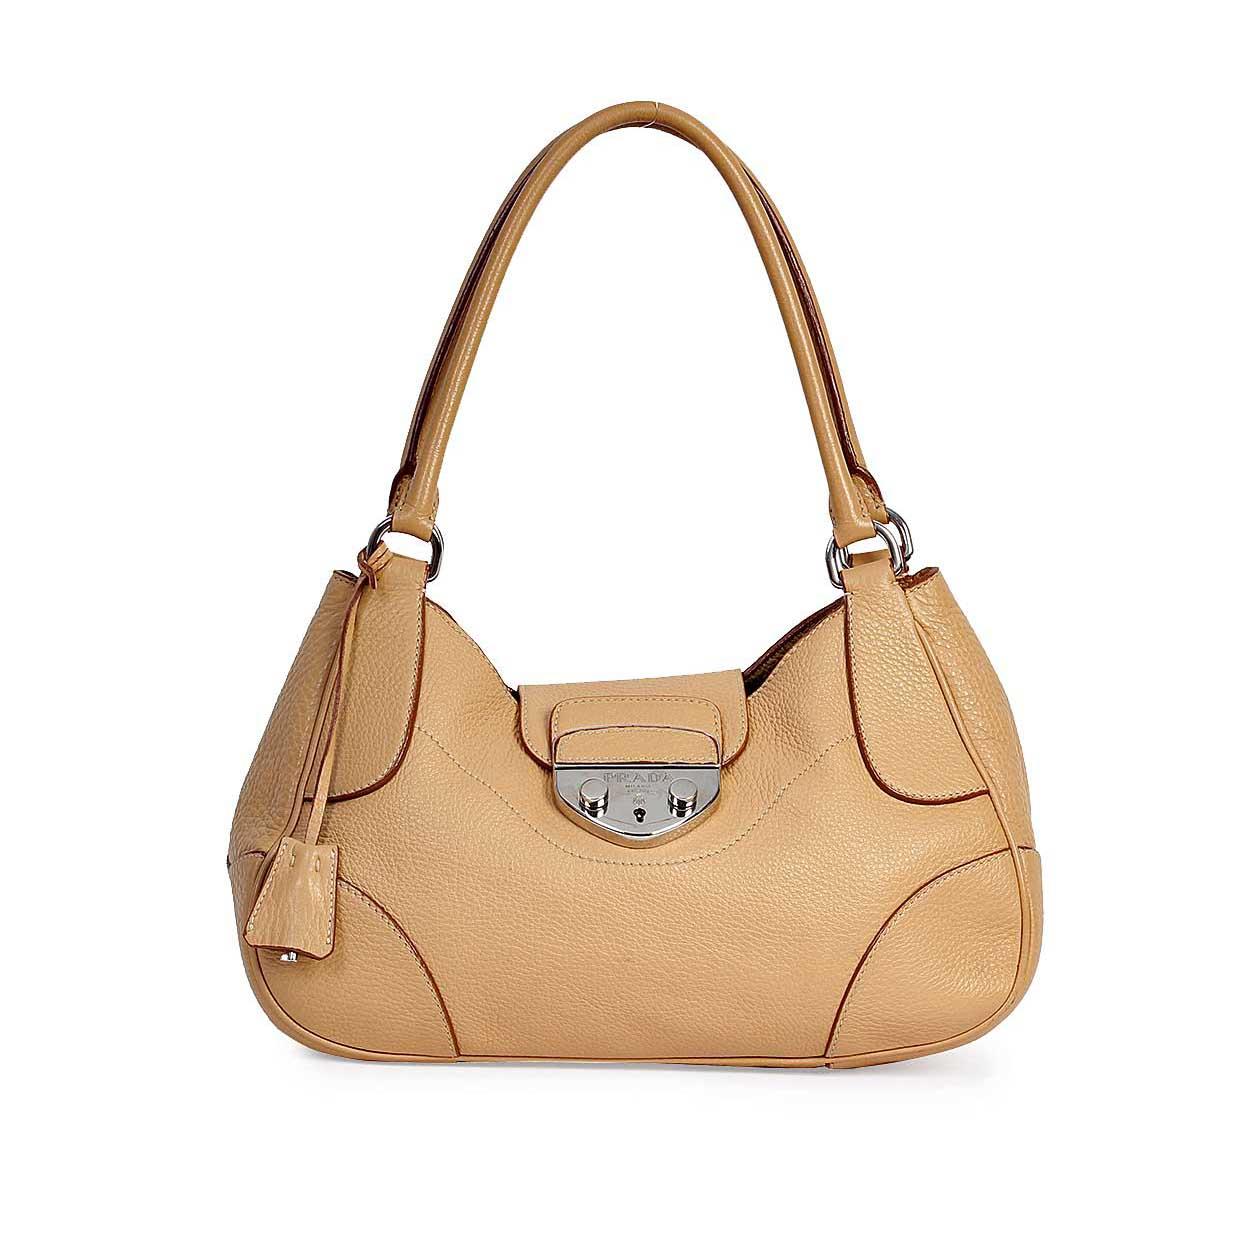 a55a99a4 PRADA Rubino Vitello Daino Leather Shopping Tote Light Brown